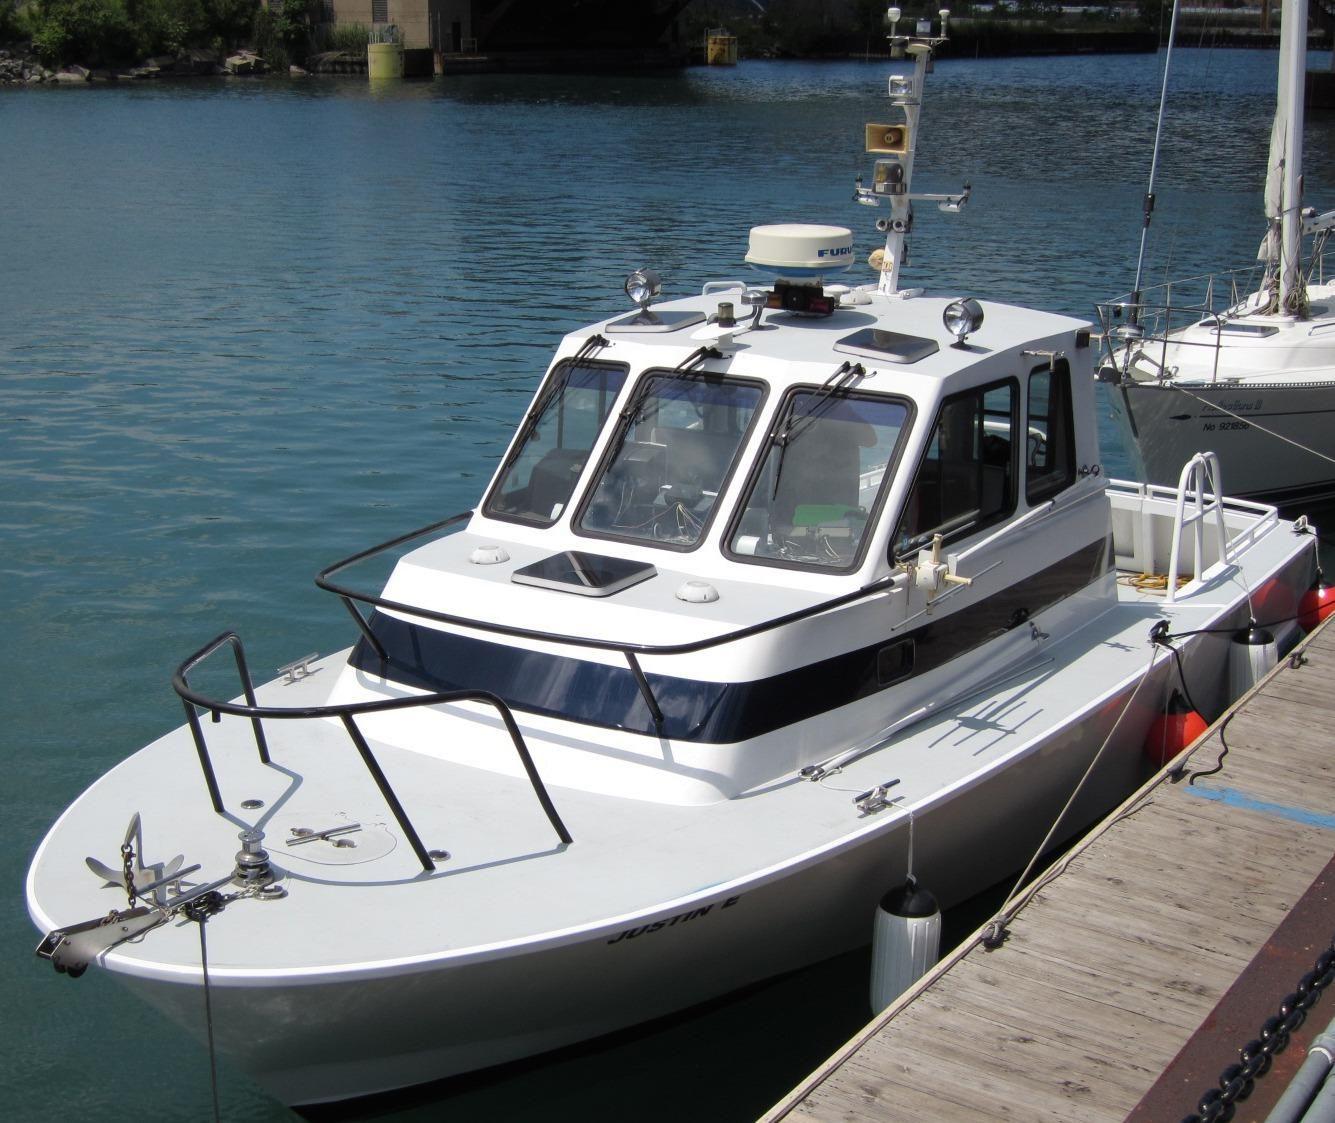 Northern Illinois Marine Dealer: 1990 Boston Whaler Defiance Power Boat For Sale